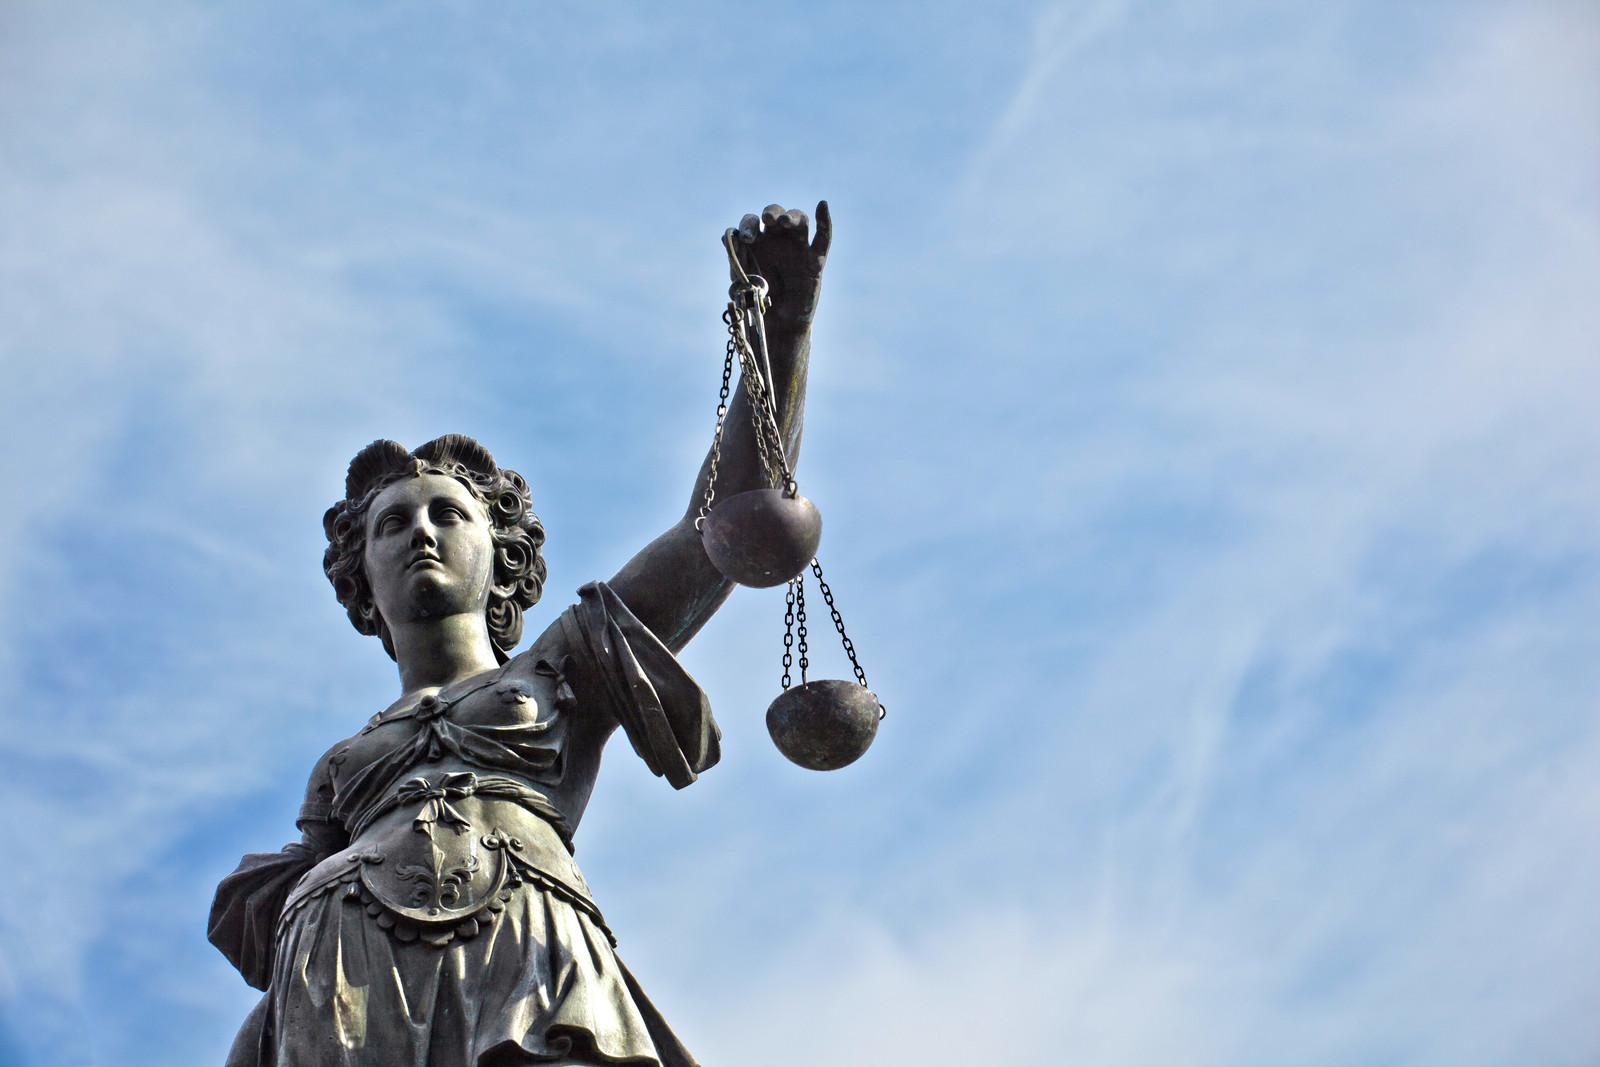 Statue av rettferdighetens gudinne, Justitia, i Frankfurt, Tyskland. (Foto: Can Stock Photo)